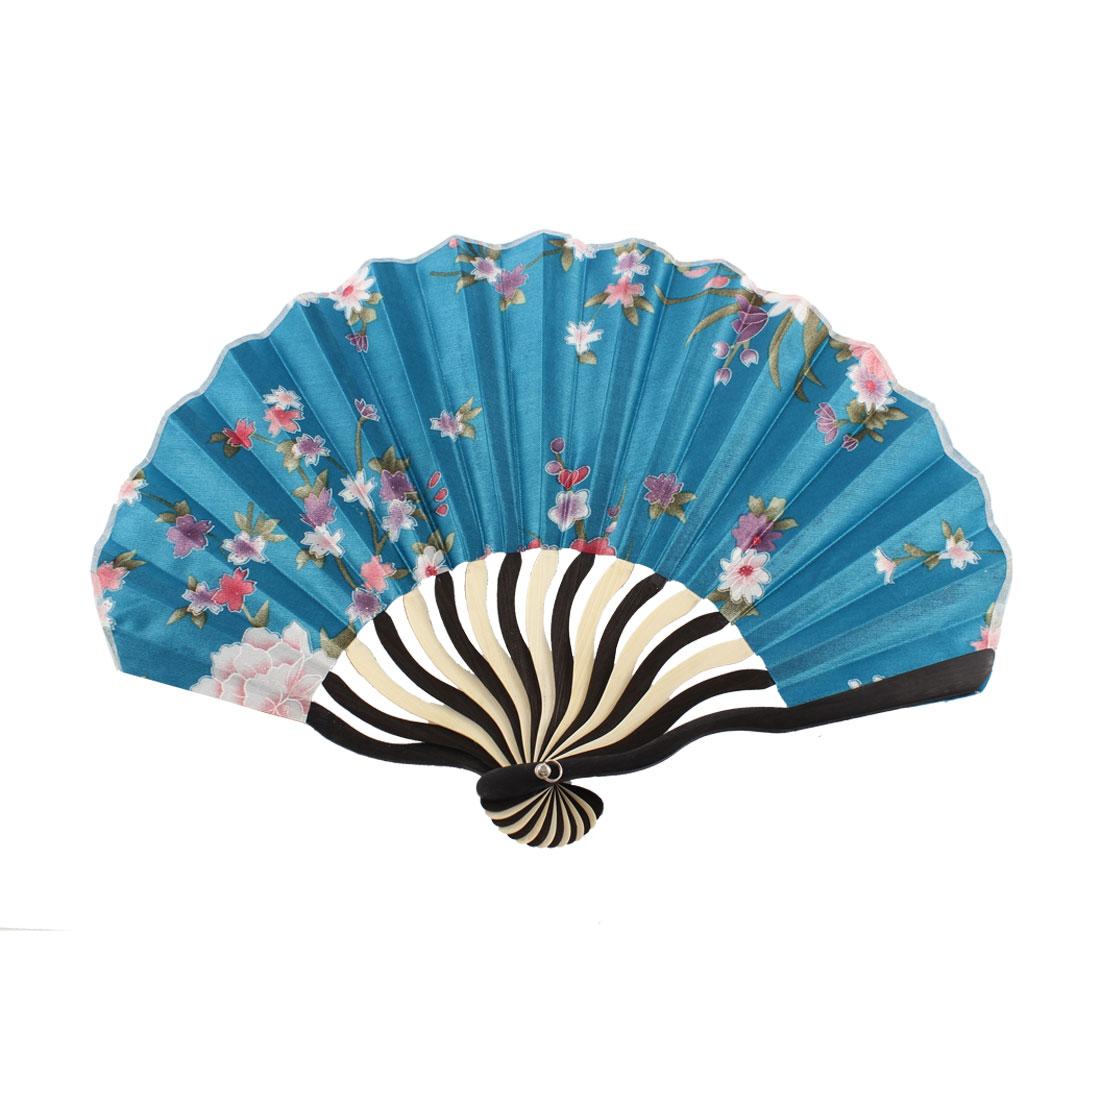 Dancer Summer Wedding Party Flower Pattern Nylon Bamboo Rib Foldable Hand Fan Gift Decoration